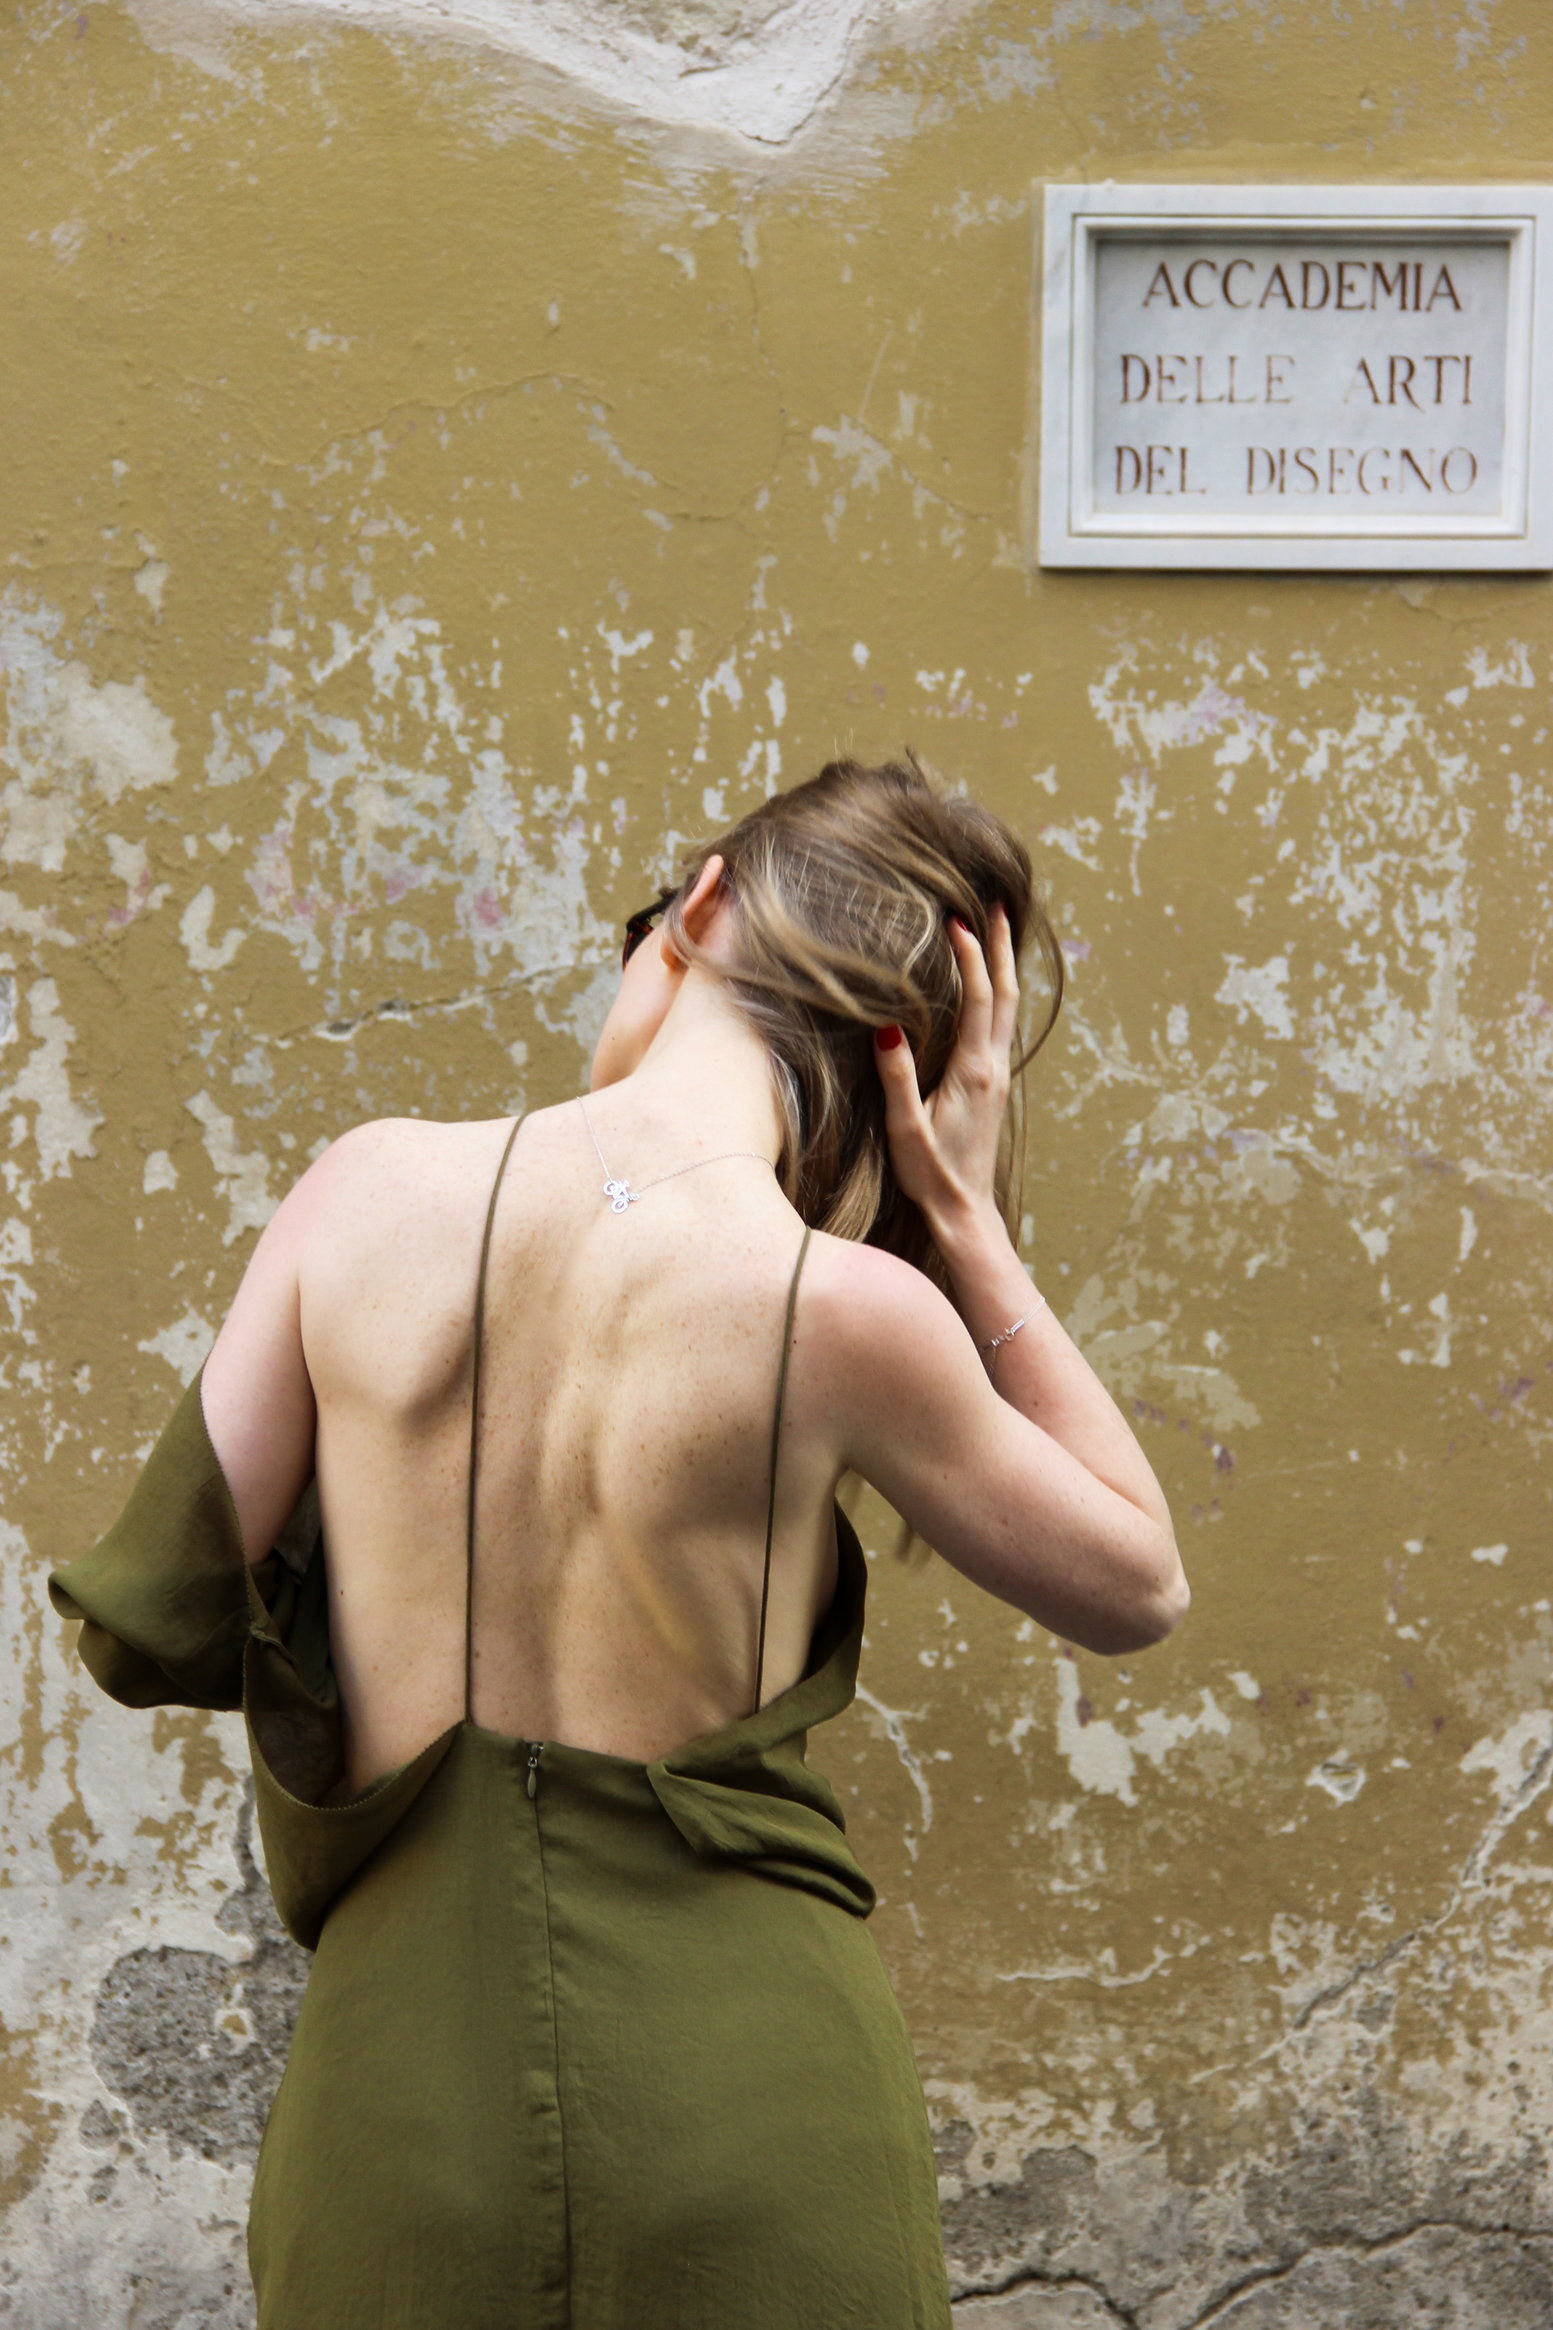 Acne-Olive-by FASHION ART MEDIA